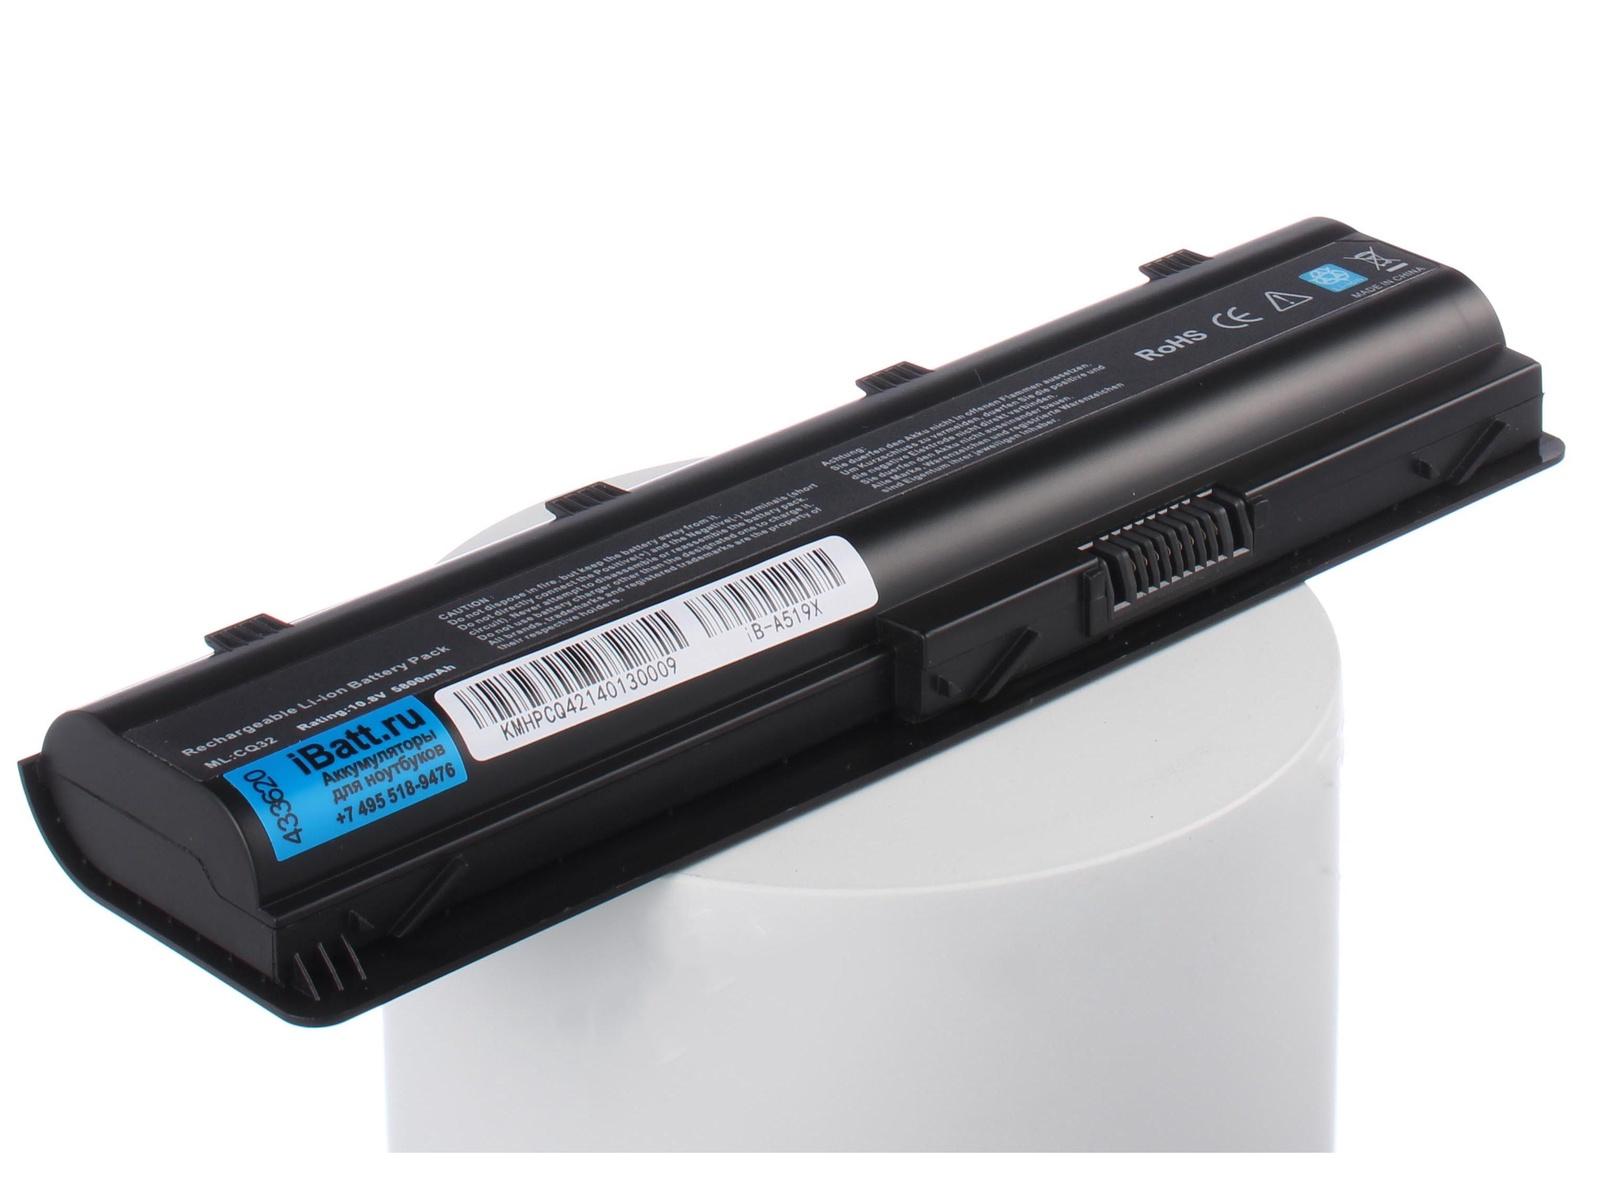 Аккумулятор для ноутбука iBatt для HP-Compaq Pavilion dv7-6025sr, Pavilion DV7-6b00, Pavilion dv7-6c52sr, Pavilion g6-1029er, Pavilion g6-1095sa, Pavilion g6-1132sr, Pavilion g6-1159sa, Pavilion g6-1165ev, Pavilion g6-1206sr